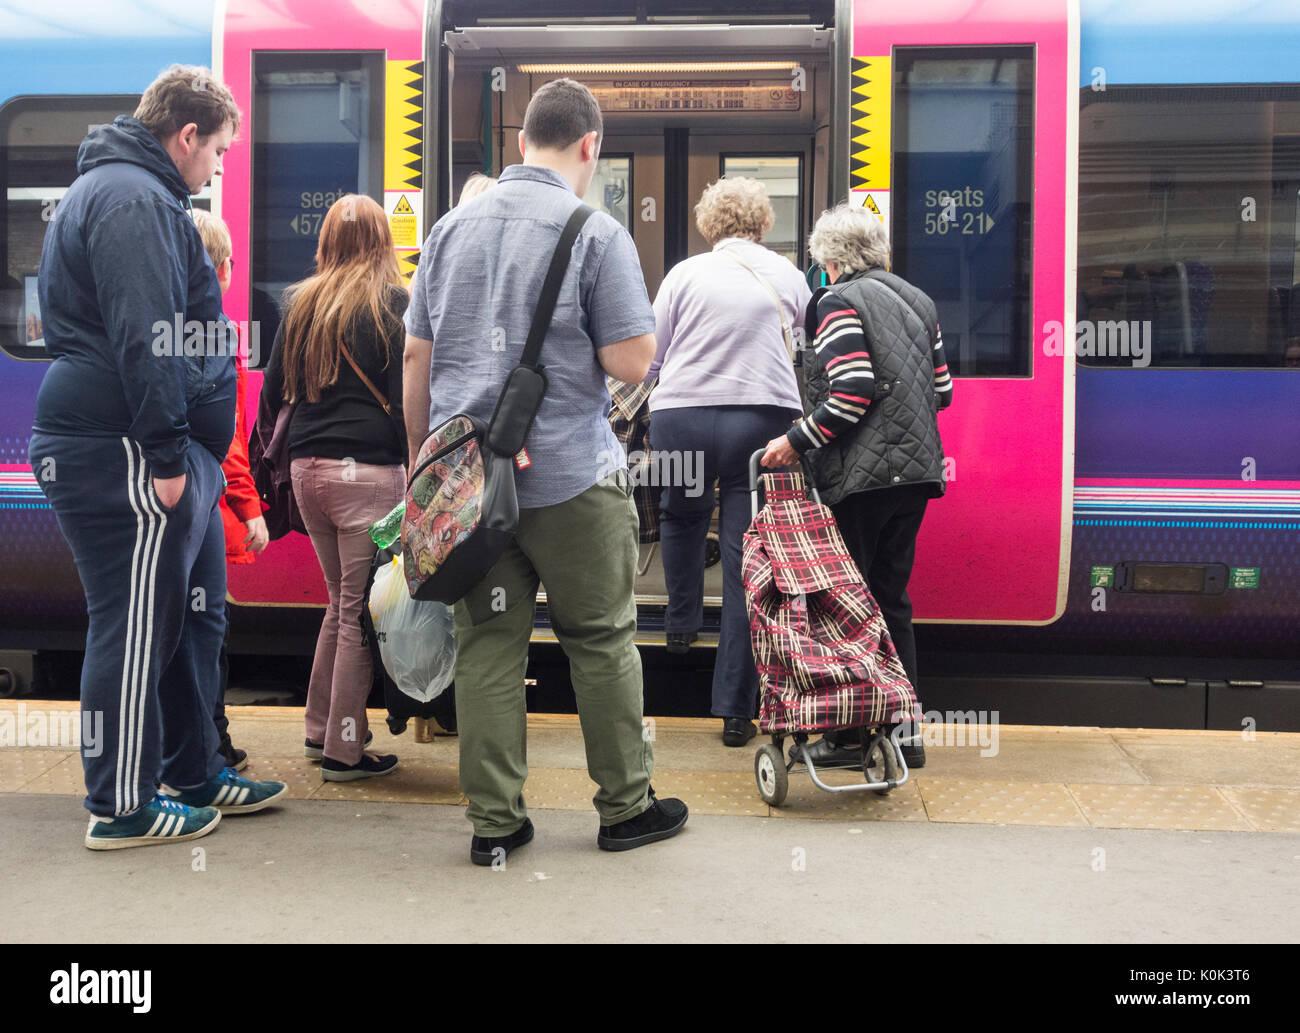 People boarding Transpennine express train at Middlesbrough station. UK - Stock Image